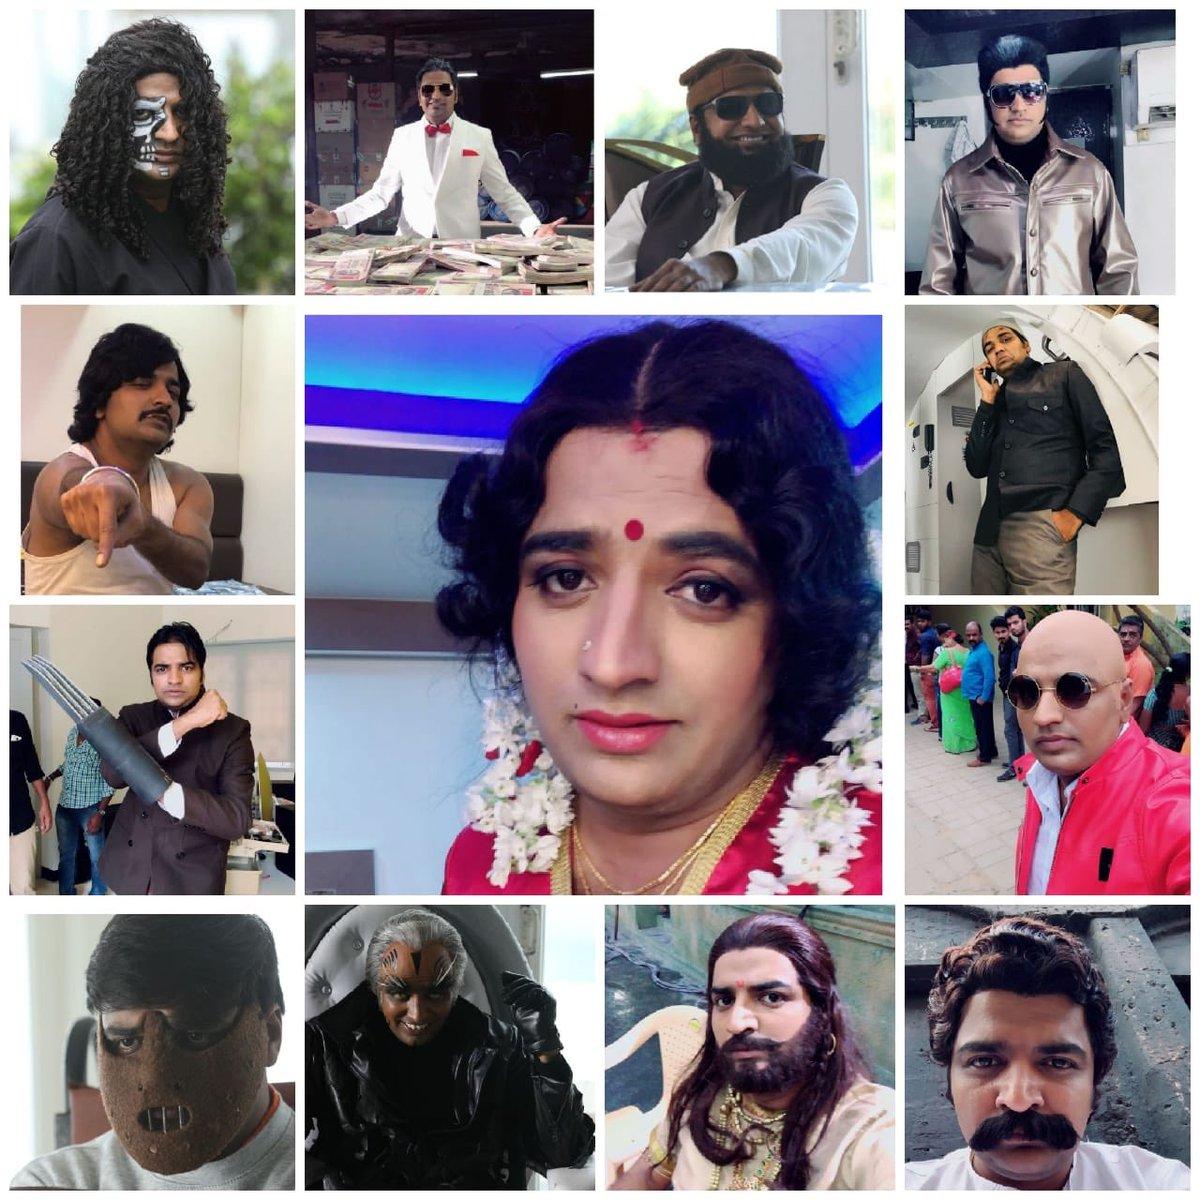 Thank u so much #NiravShah sir🙏🏻 Because of u only I got #Tamizhpadam1 chance. Thank u very much @csamudhan bro @sash041075 bro @actorshiva bro @editorsuresh @gopiamar Tpt1&2 team Of course god and Cinema  fans 🙏🏻🙏🏻🙏🏻 #ThamizhPadam2